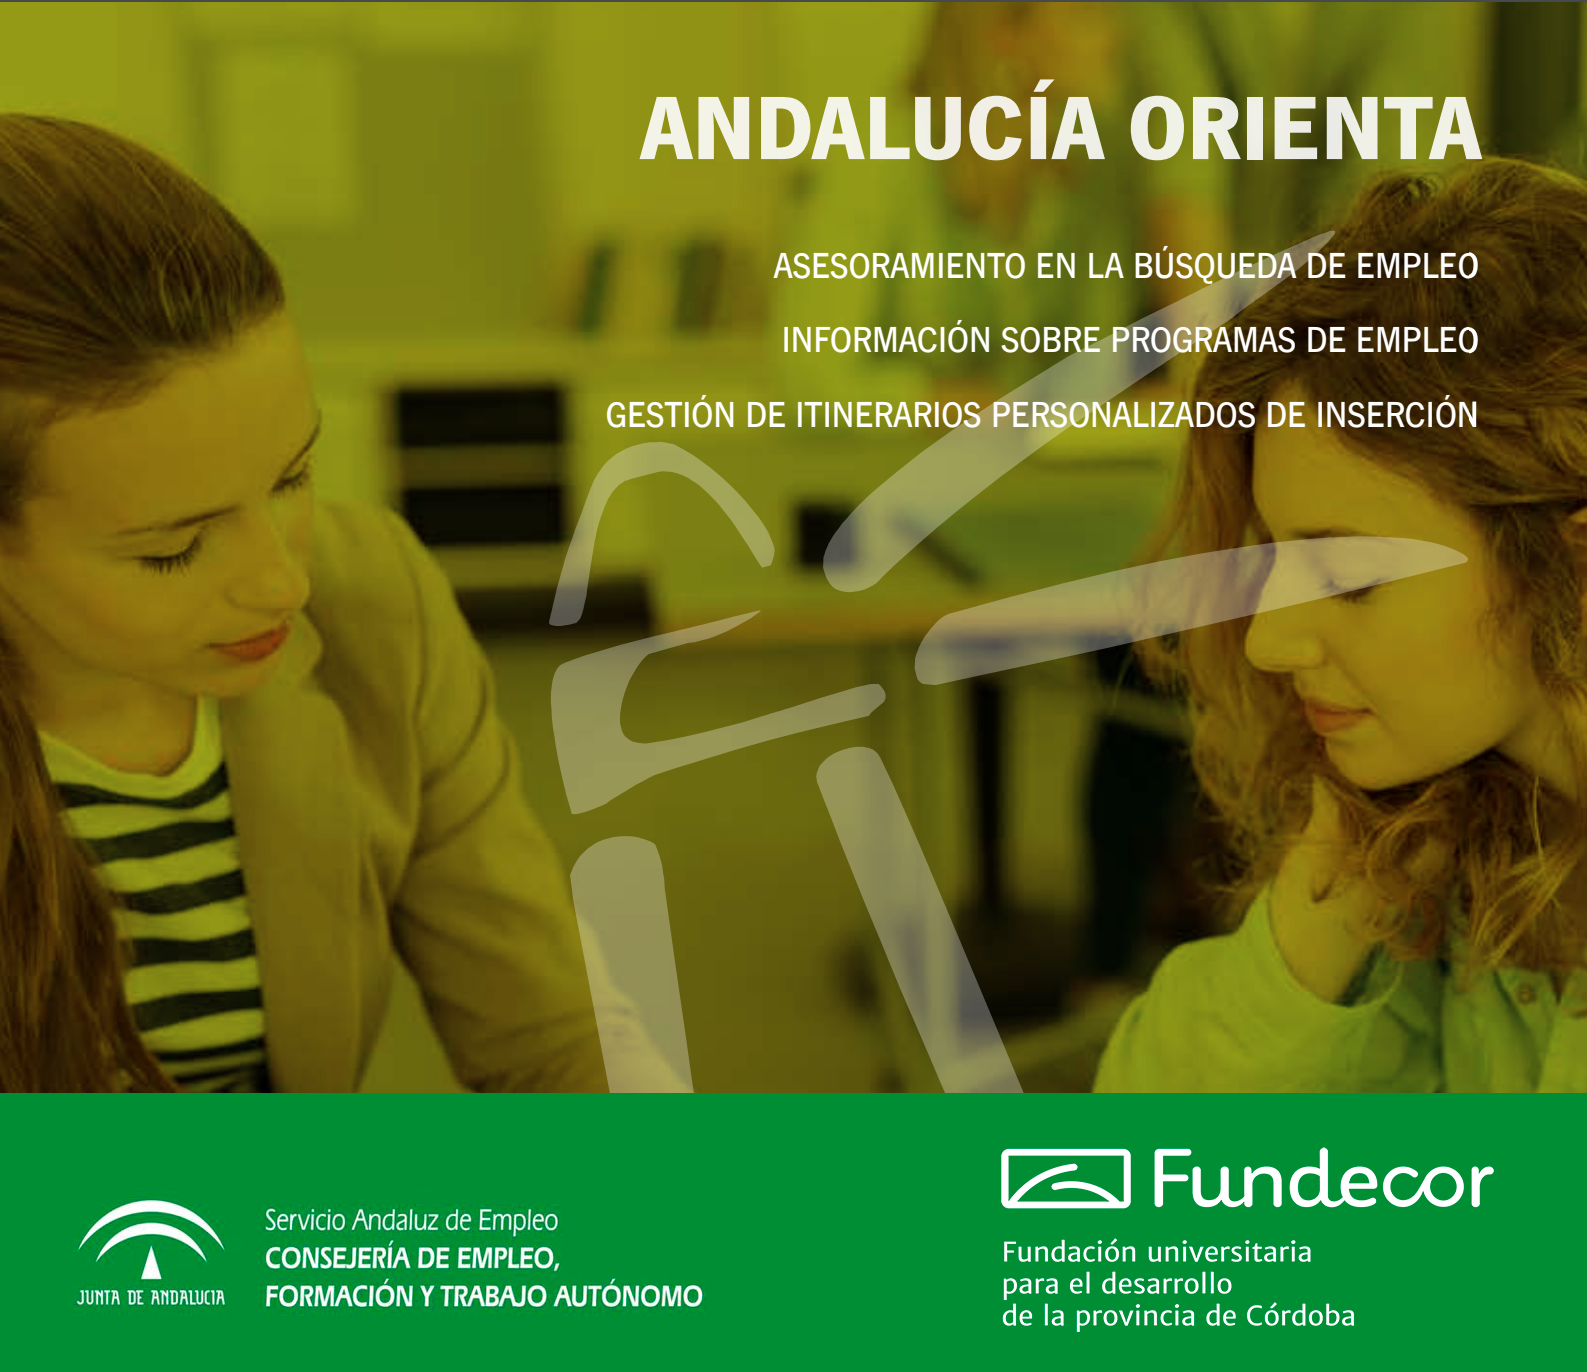 Andalucía Orienta Fundecor